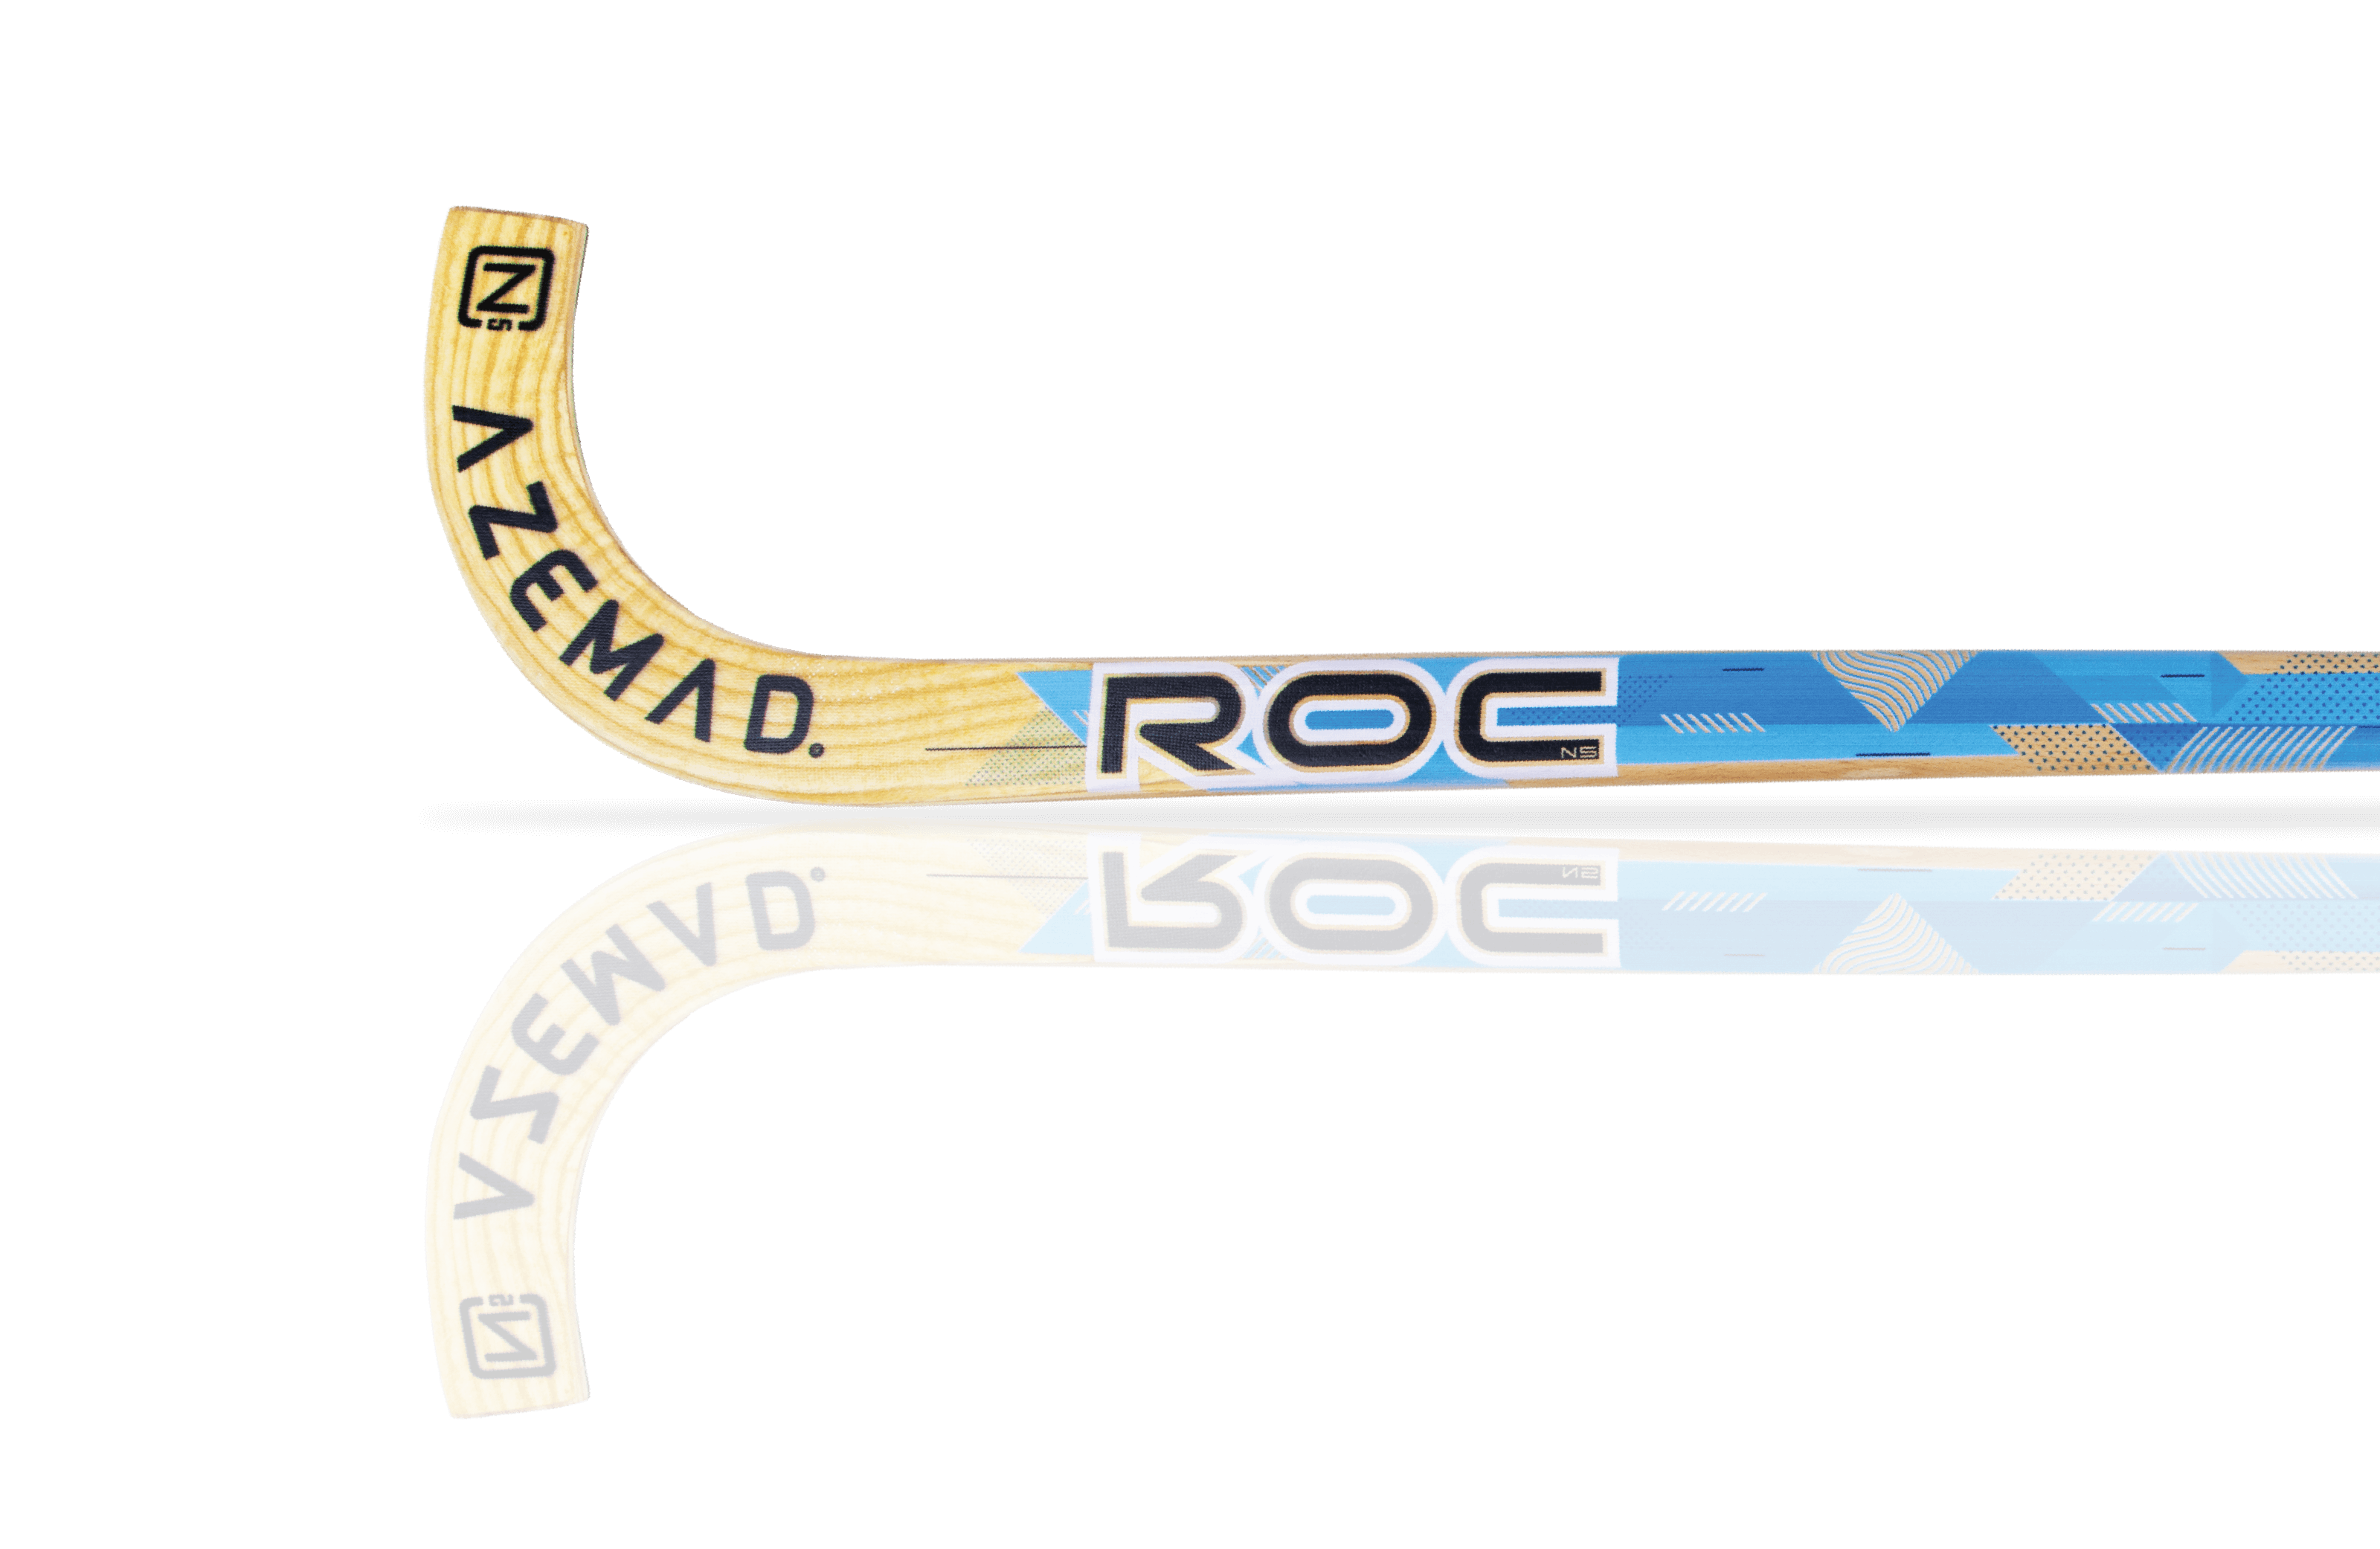 AZEMAD ROC CN5